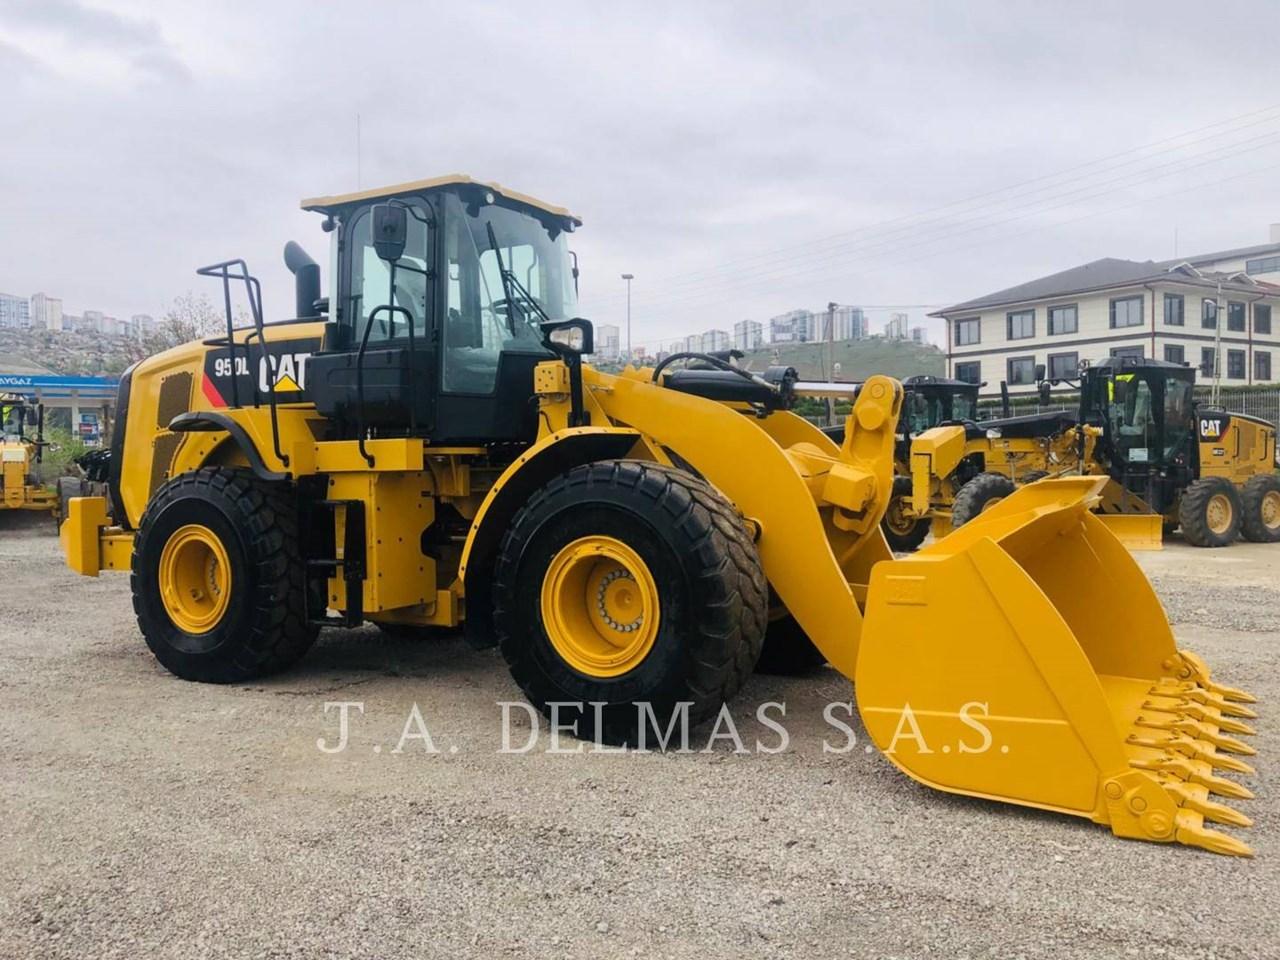 2018 Caterpillar 950L Image 4